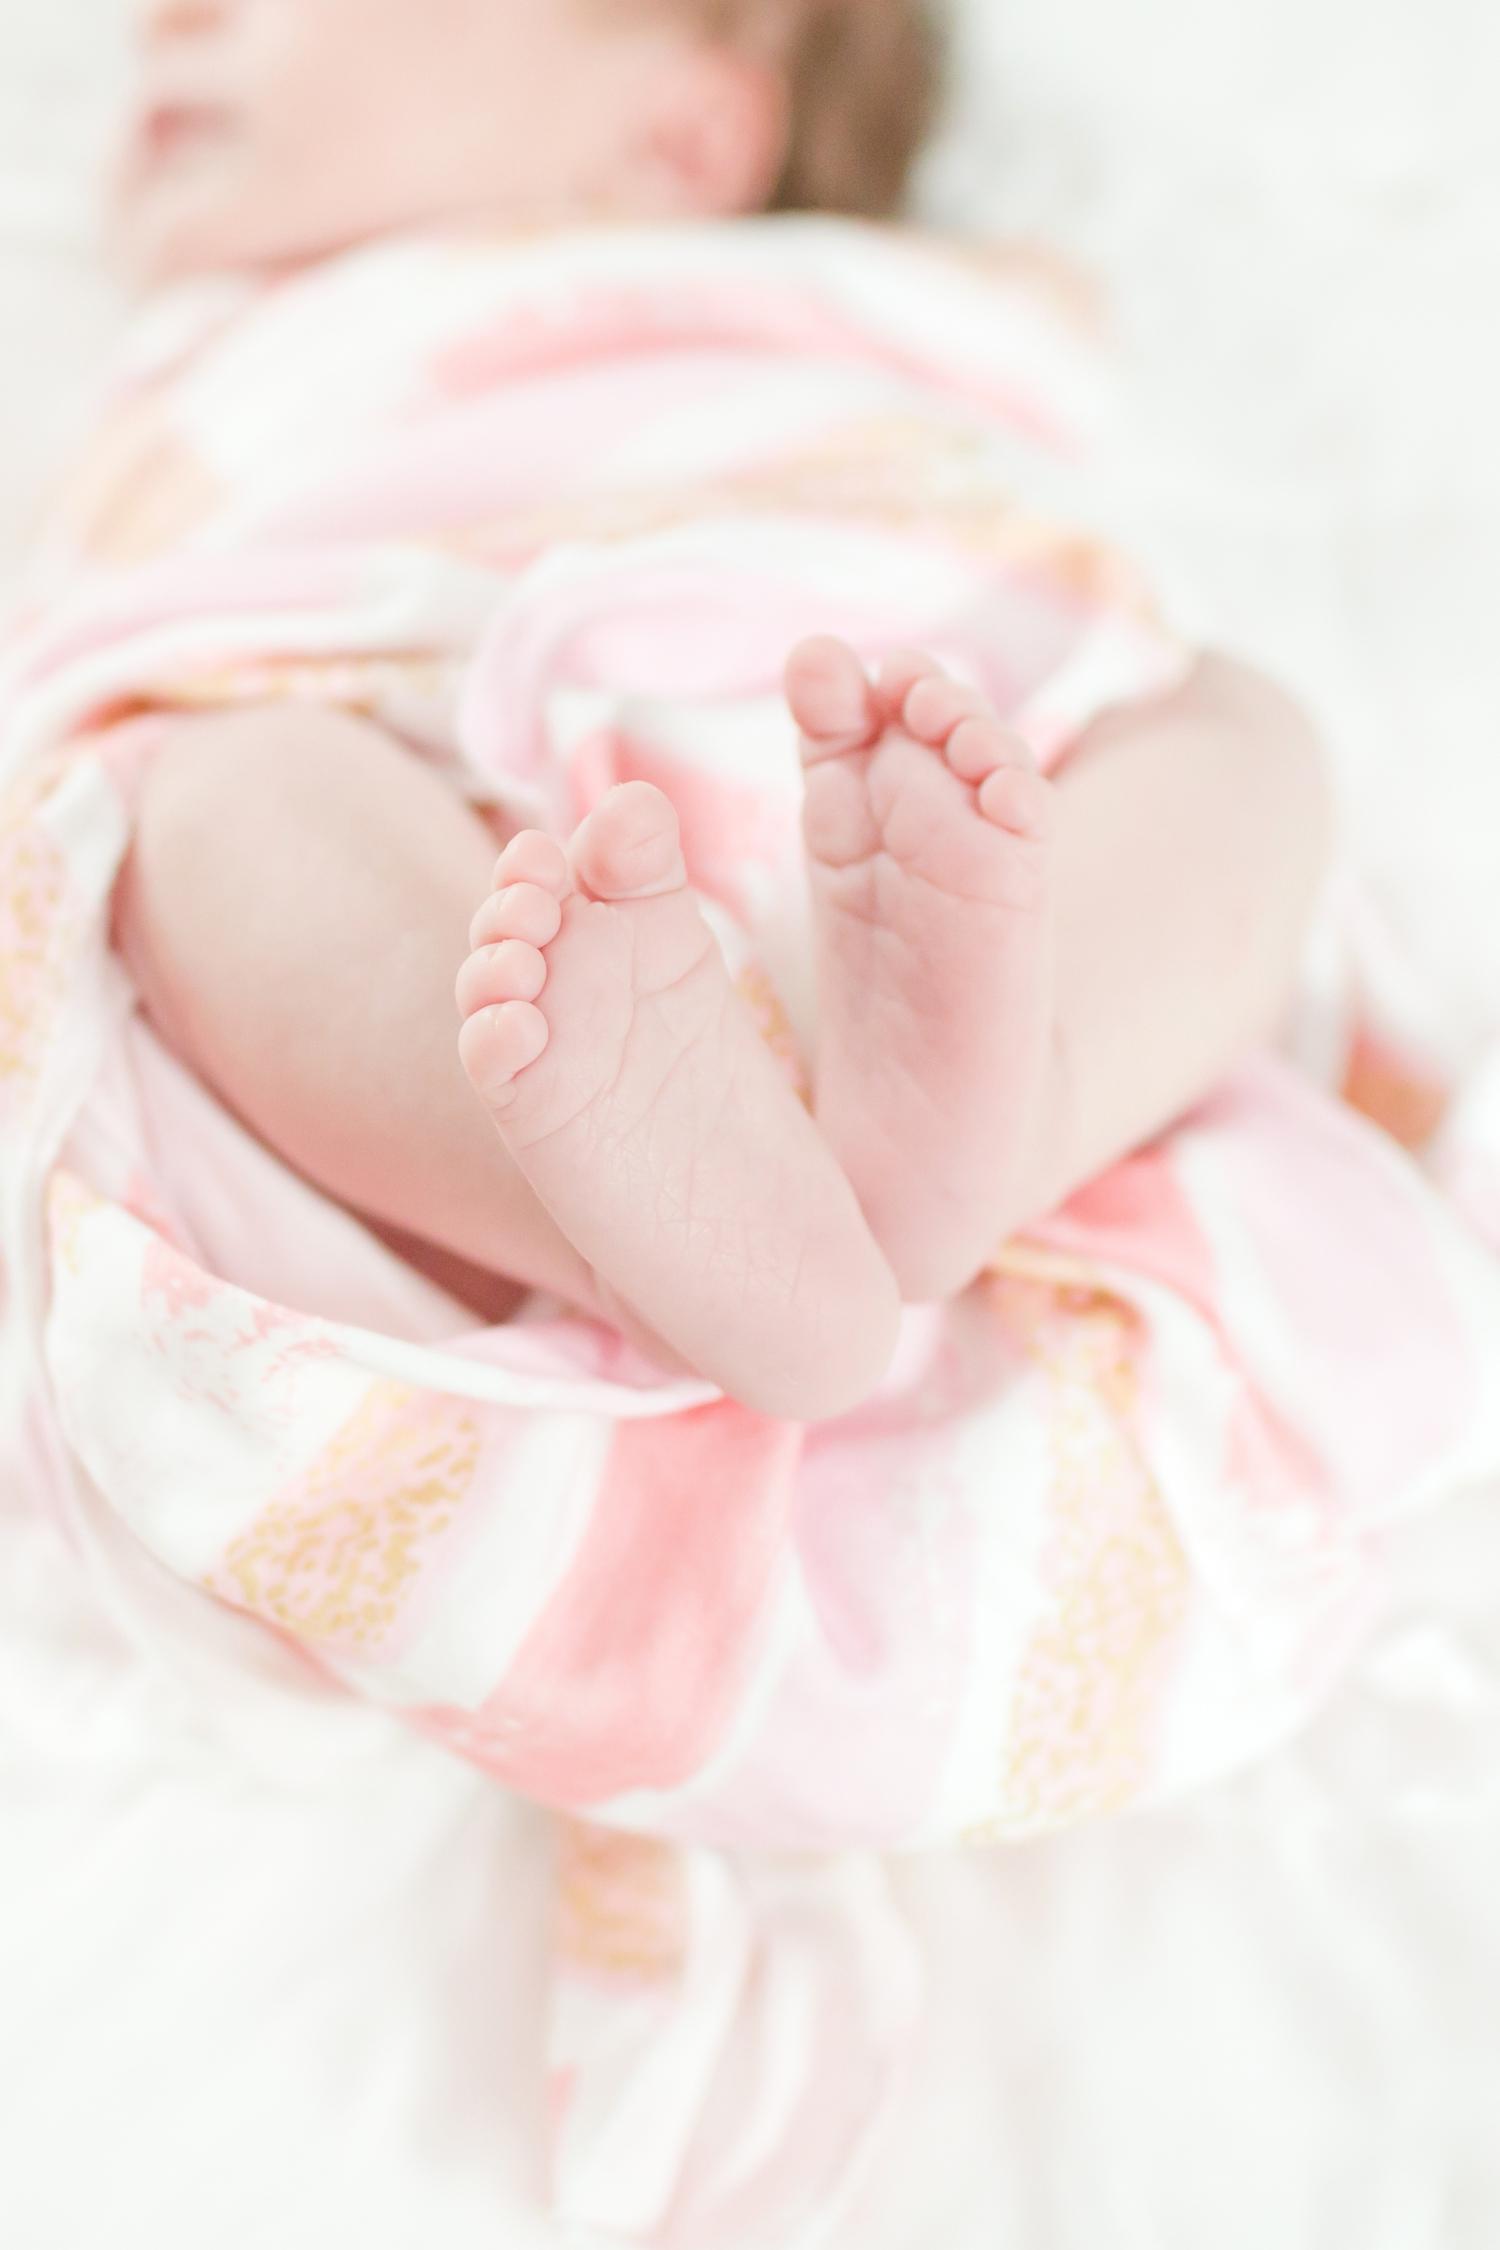 Miano Newborn-117_anna grace photography newborn photography baltimore maryland newborn and family photographer photo.jpg